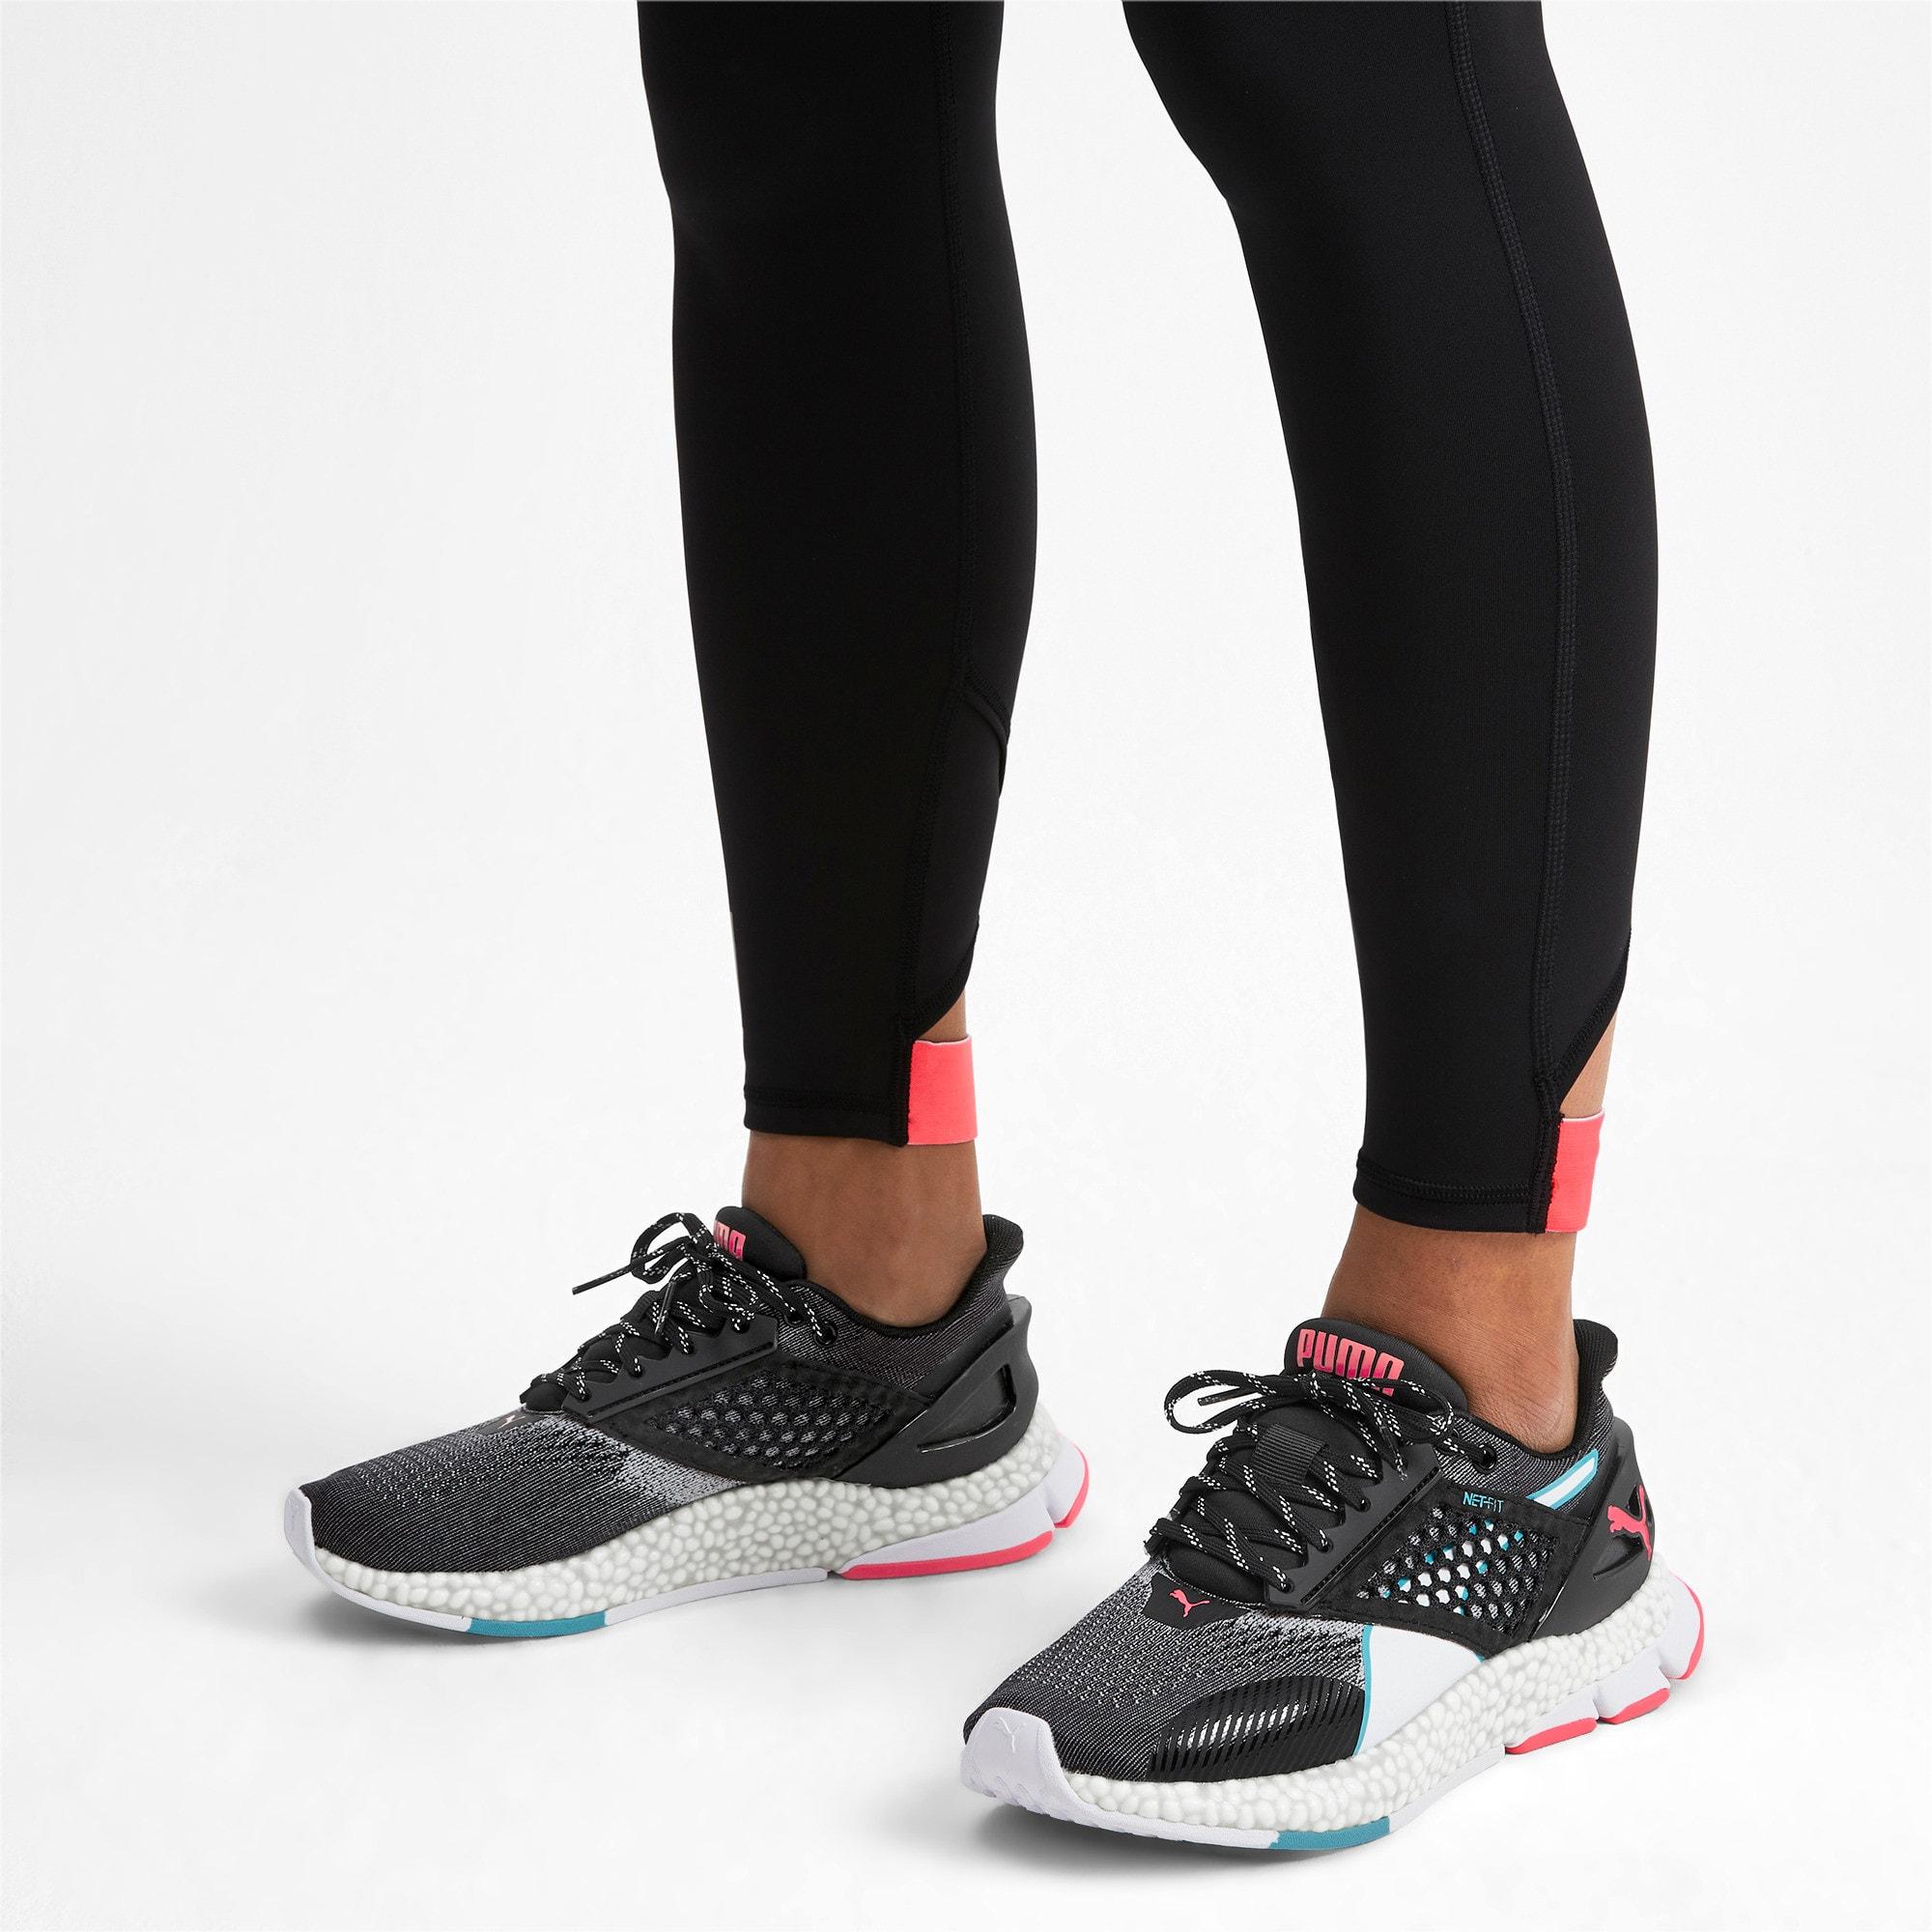 Thumbnail 2 of HYBRID NETFIT Astro Women's Running Shoes, Puma Black-Pink Alert, medium-IND